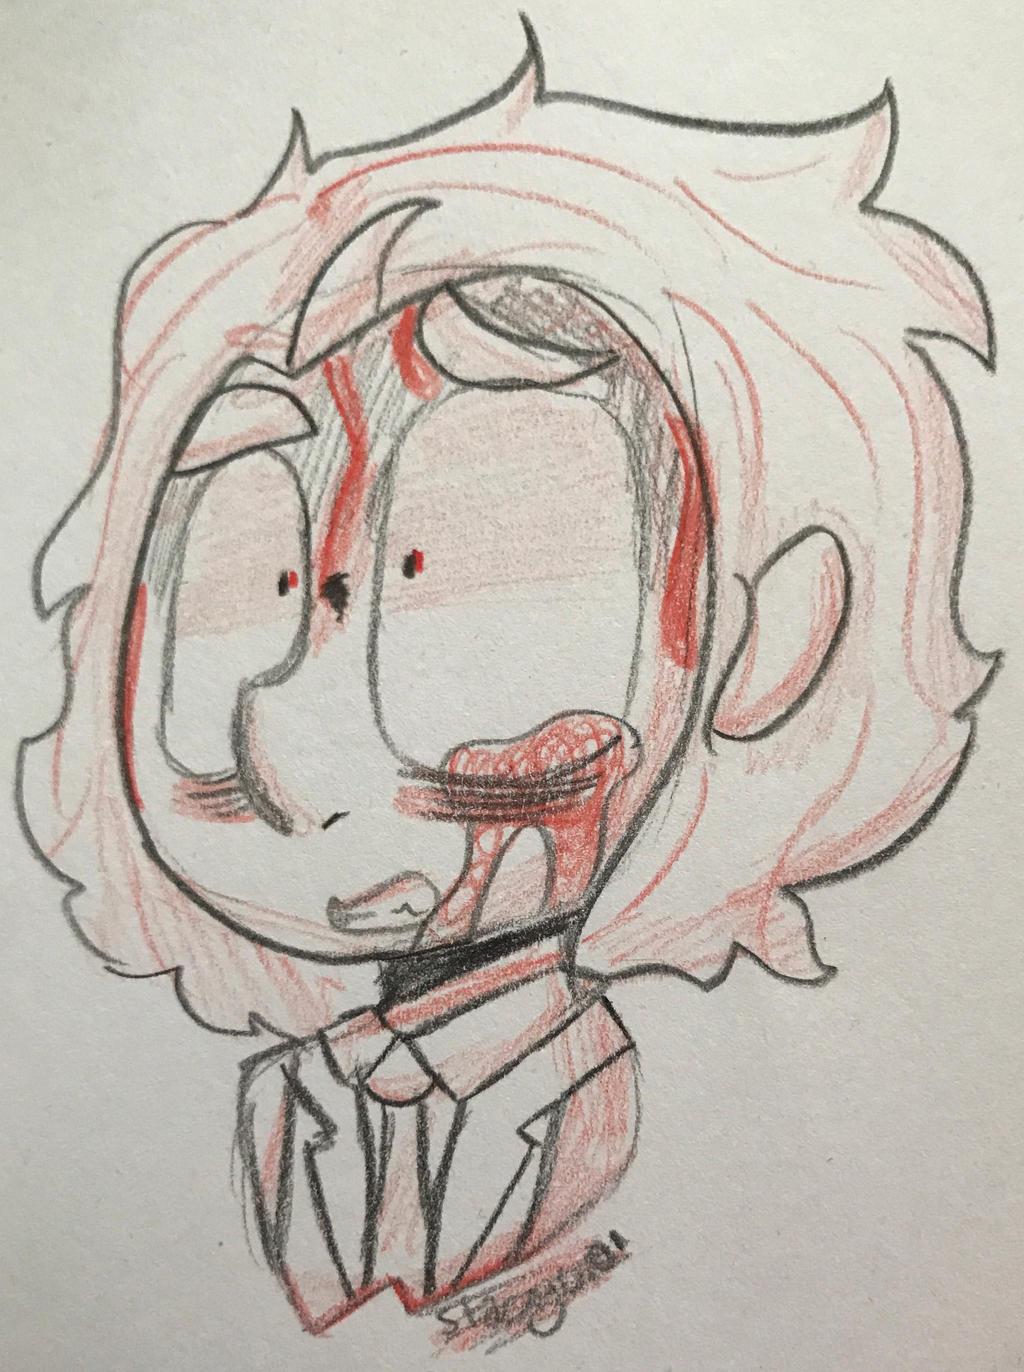 .:Shaded Headshot for RlDDLER:. by SleepyStaceyArt